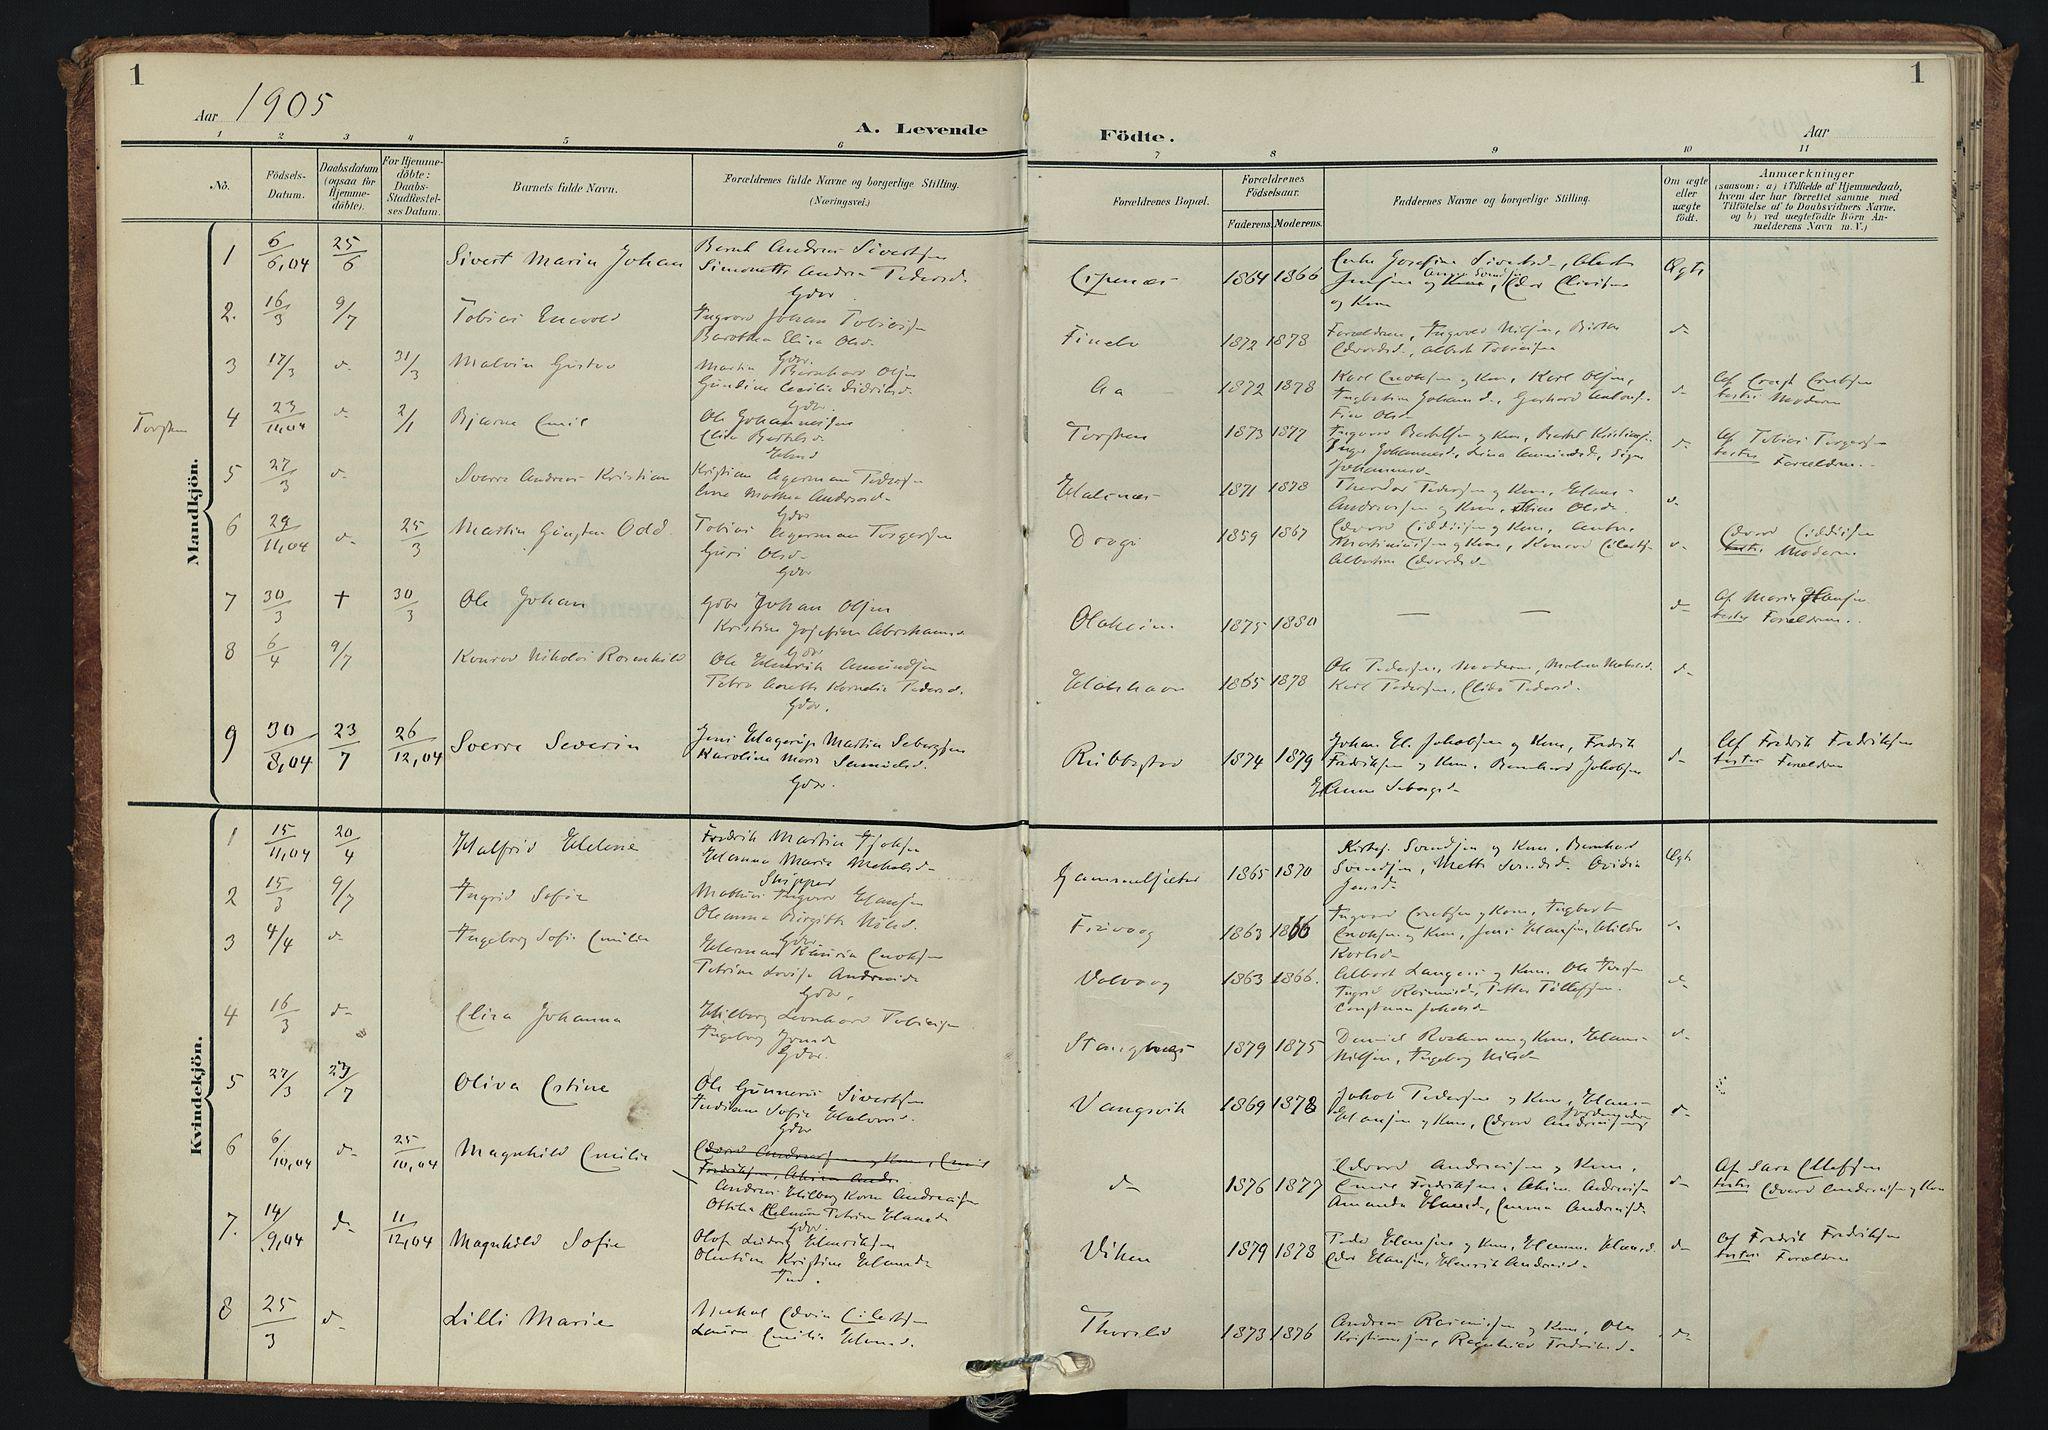 SATØ, Tranøy sokneprestkontor, I/Ia/Iaa/L0014kirke: Ministerialbok nr. 14, 1905-1919, s. 1